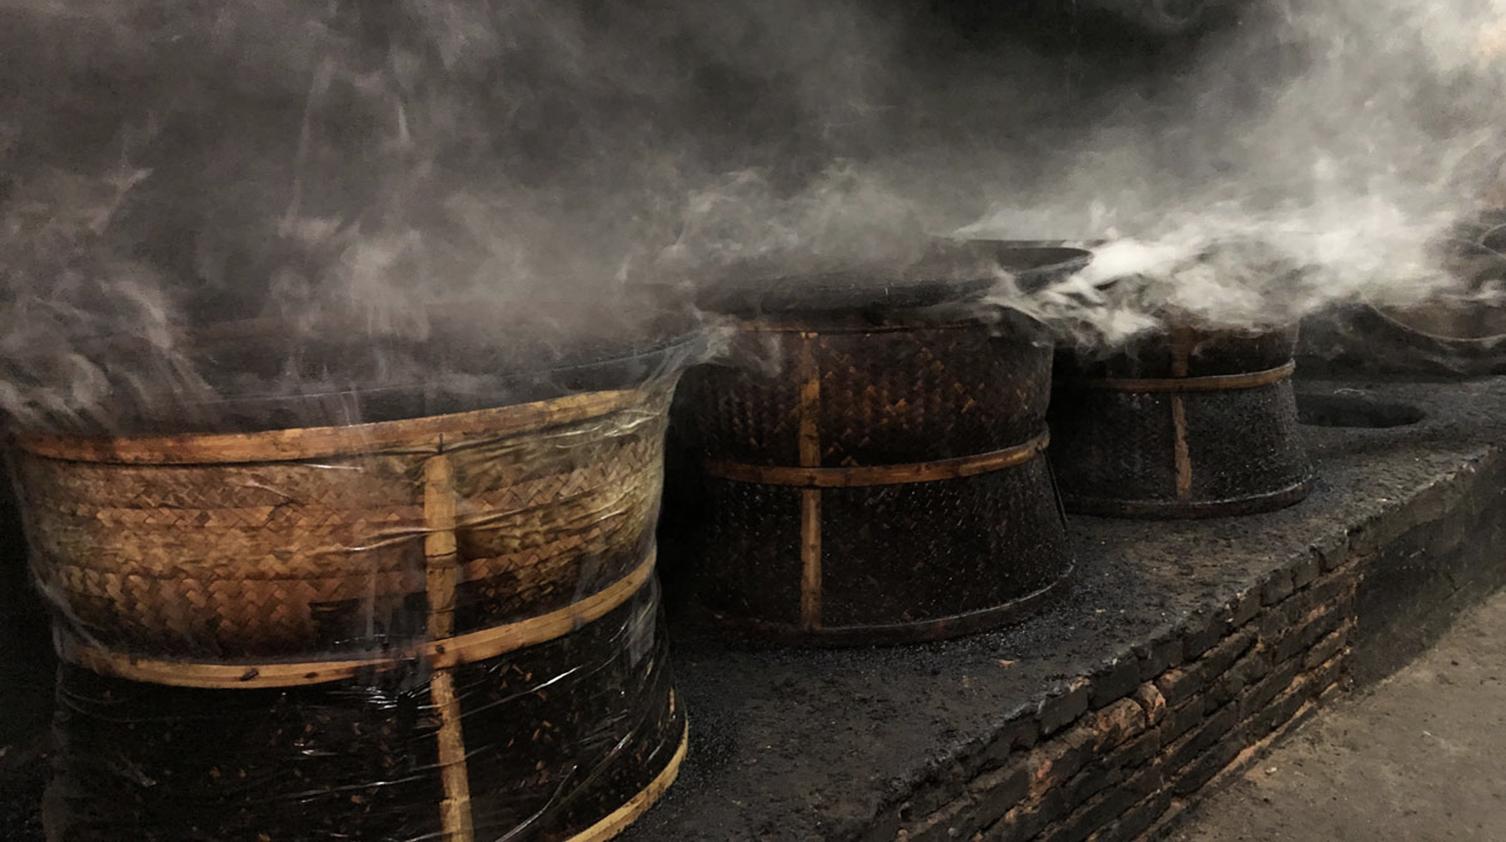 lapsang souchong production process for black tea